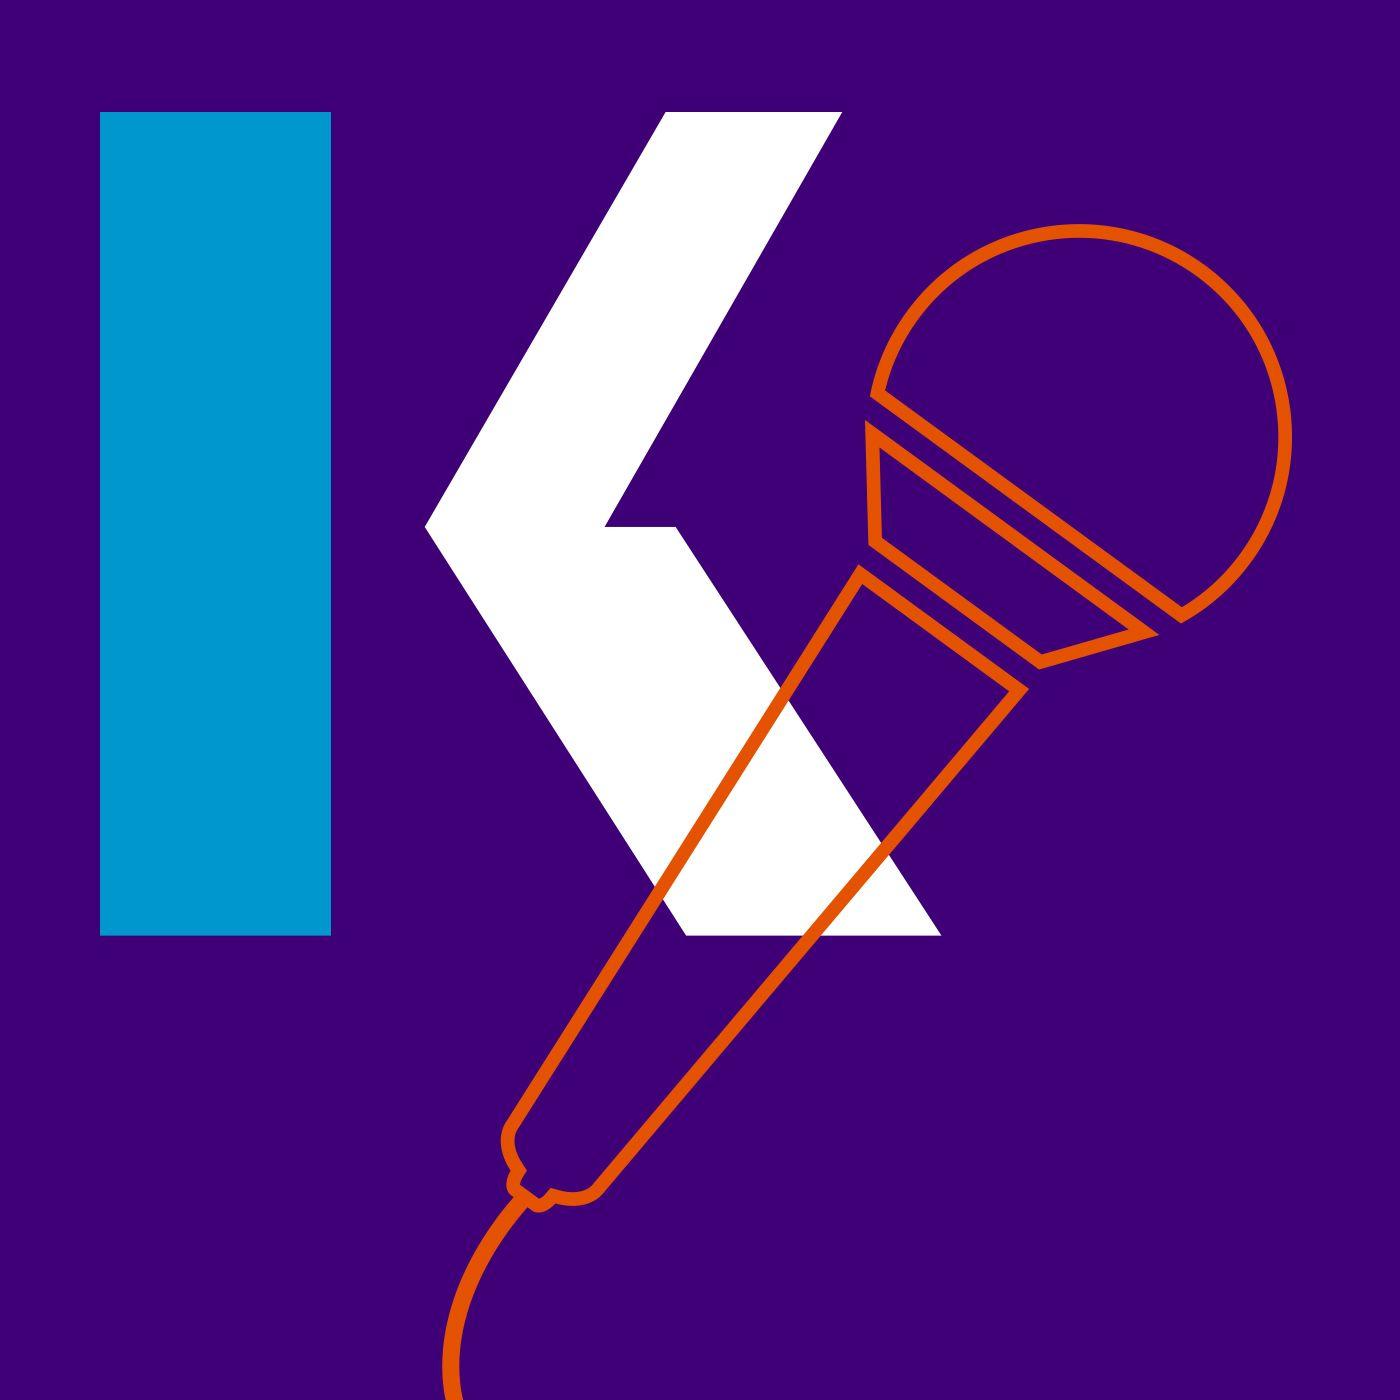 Kaplan's NCLEX Prepcast - Episode 36 - Psychosocial Integrity